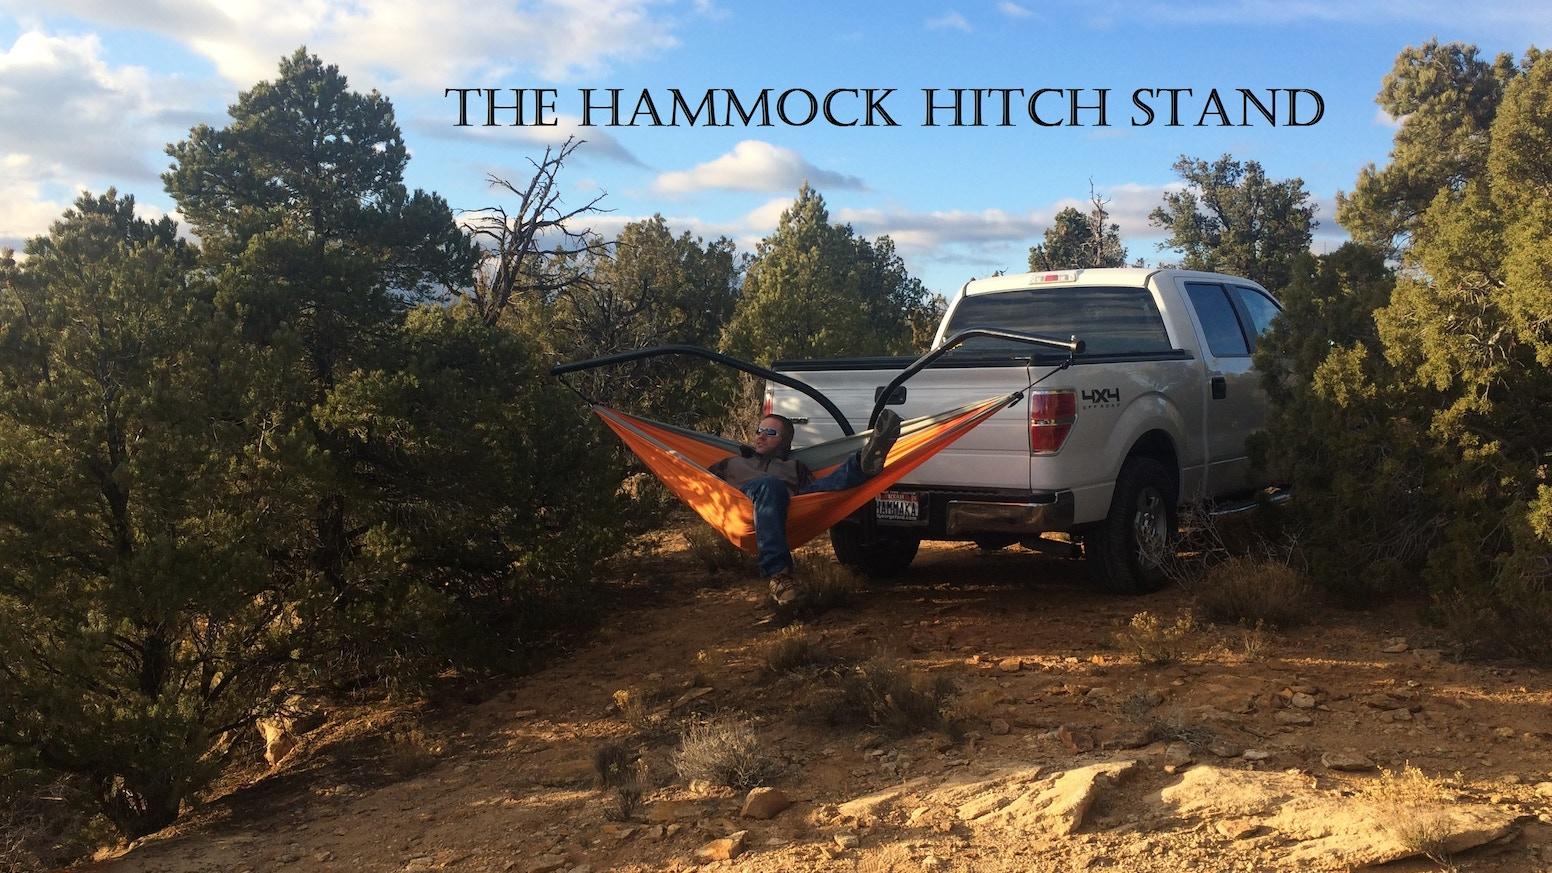 The Hammock Hitch Stand By King S Pond Hammaka Kickstarter